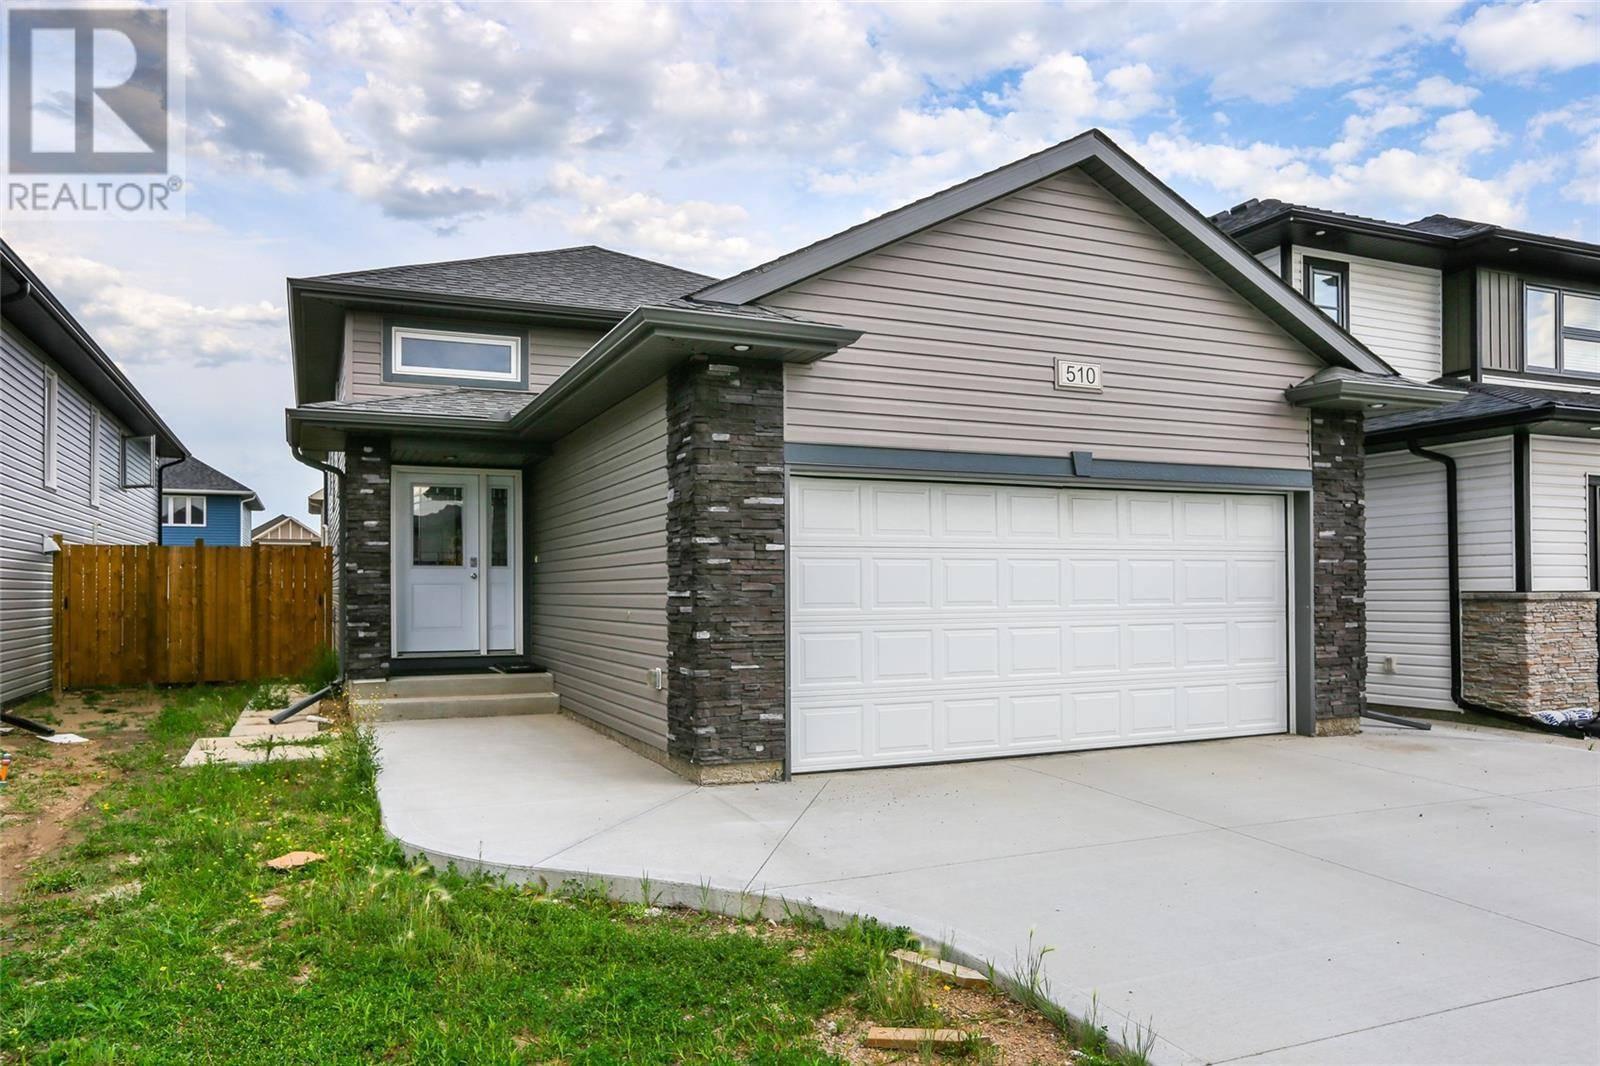 House for sale at 510 Kolynchuk Cres Saskatoon Saskatchewan - MLS: SK782824